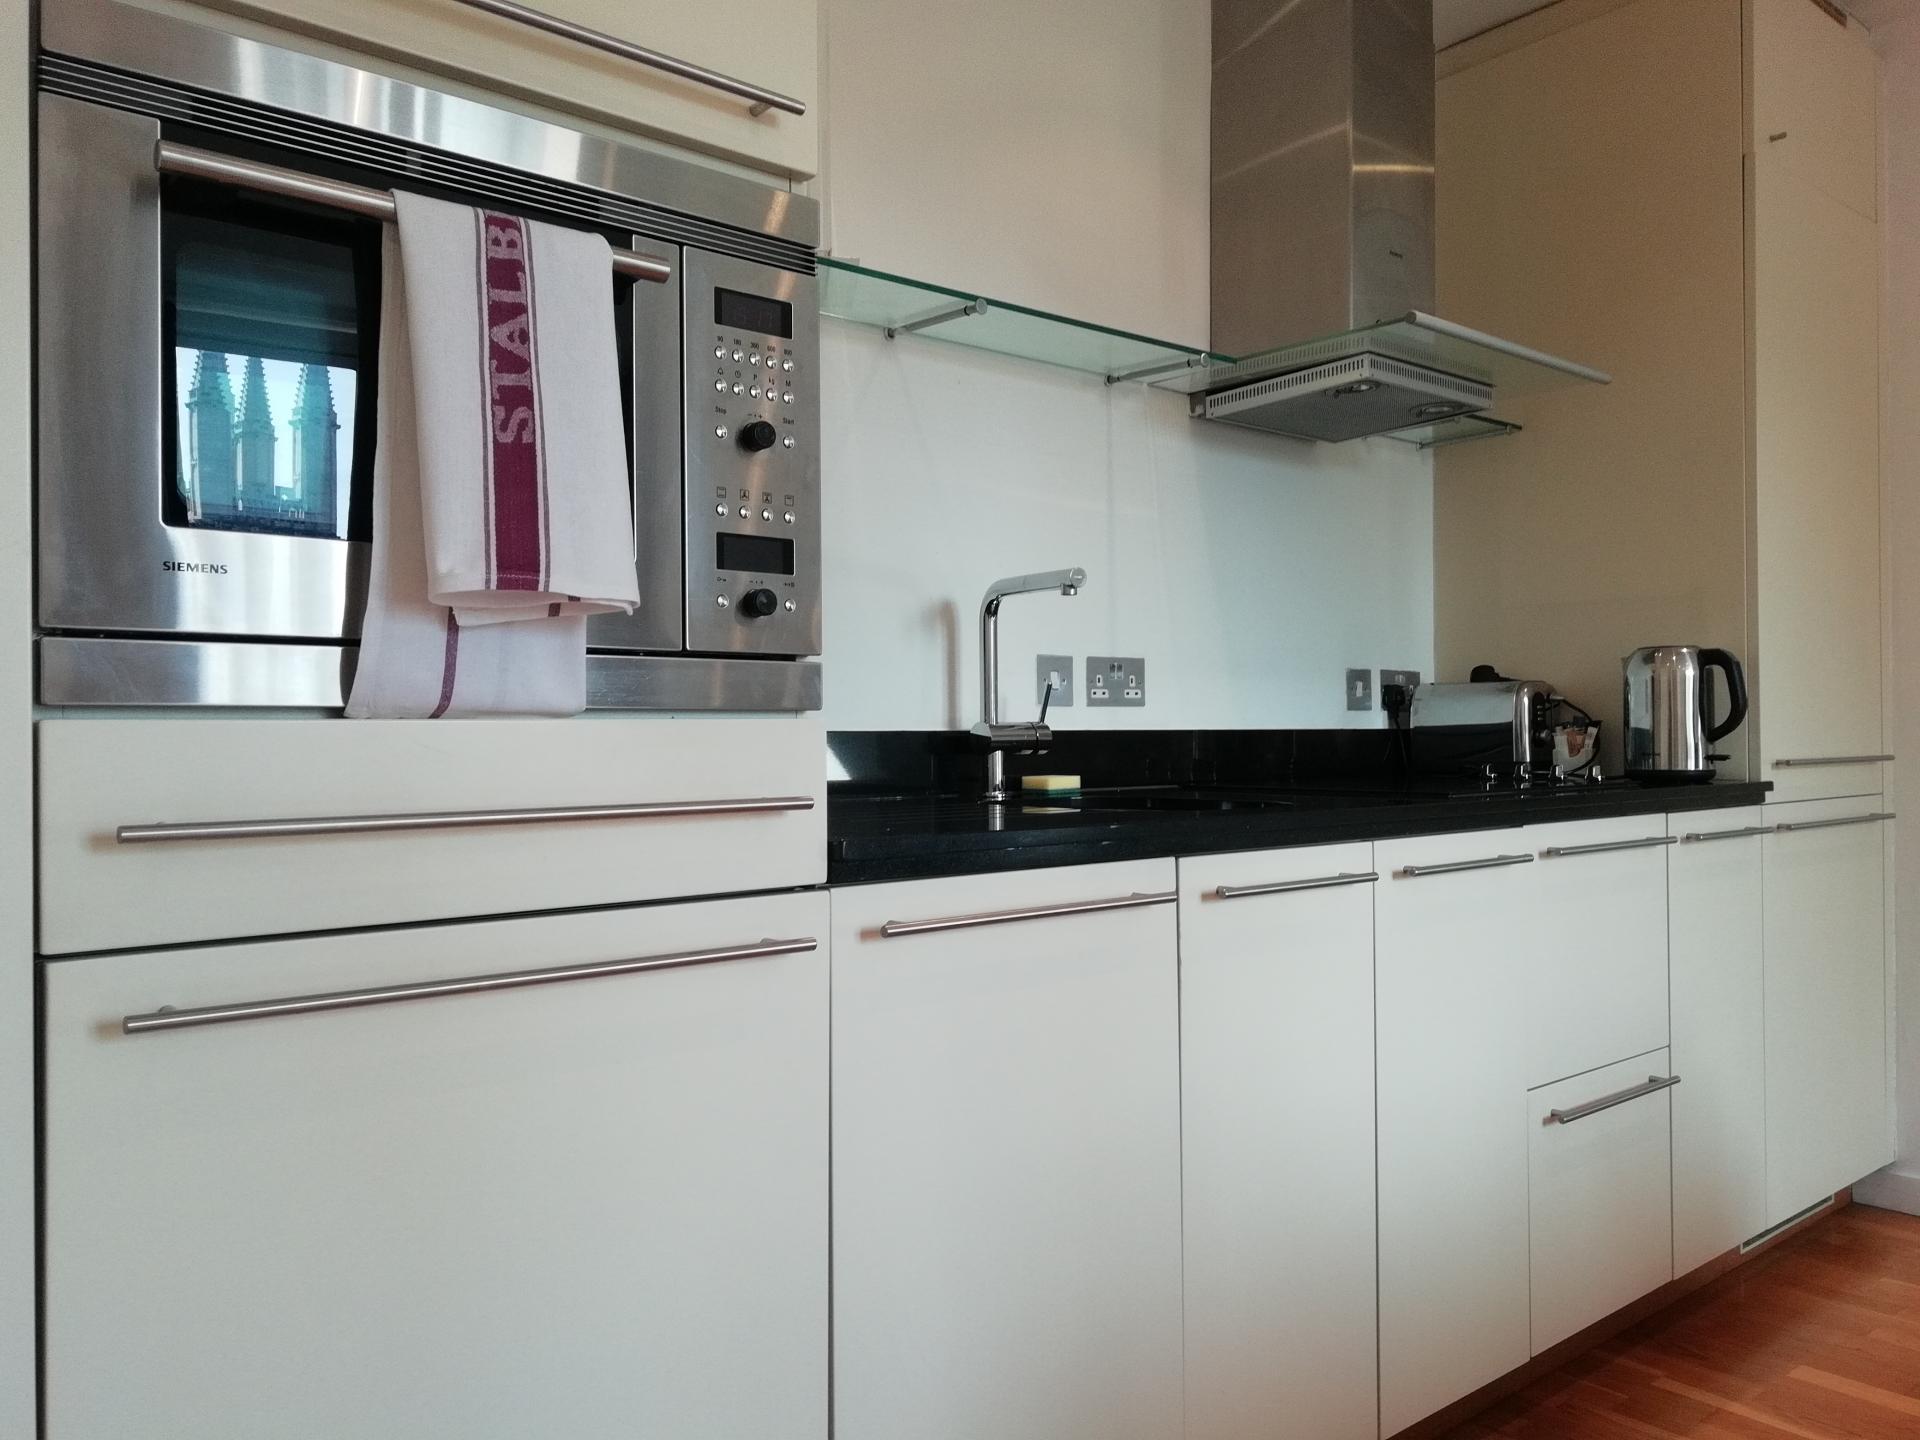 Kitchen at Still Life St Paul's Executive, Farringdon, London - Citybase Apartments